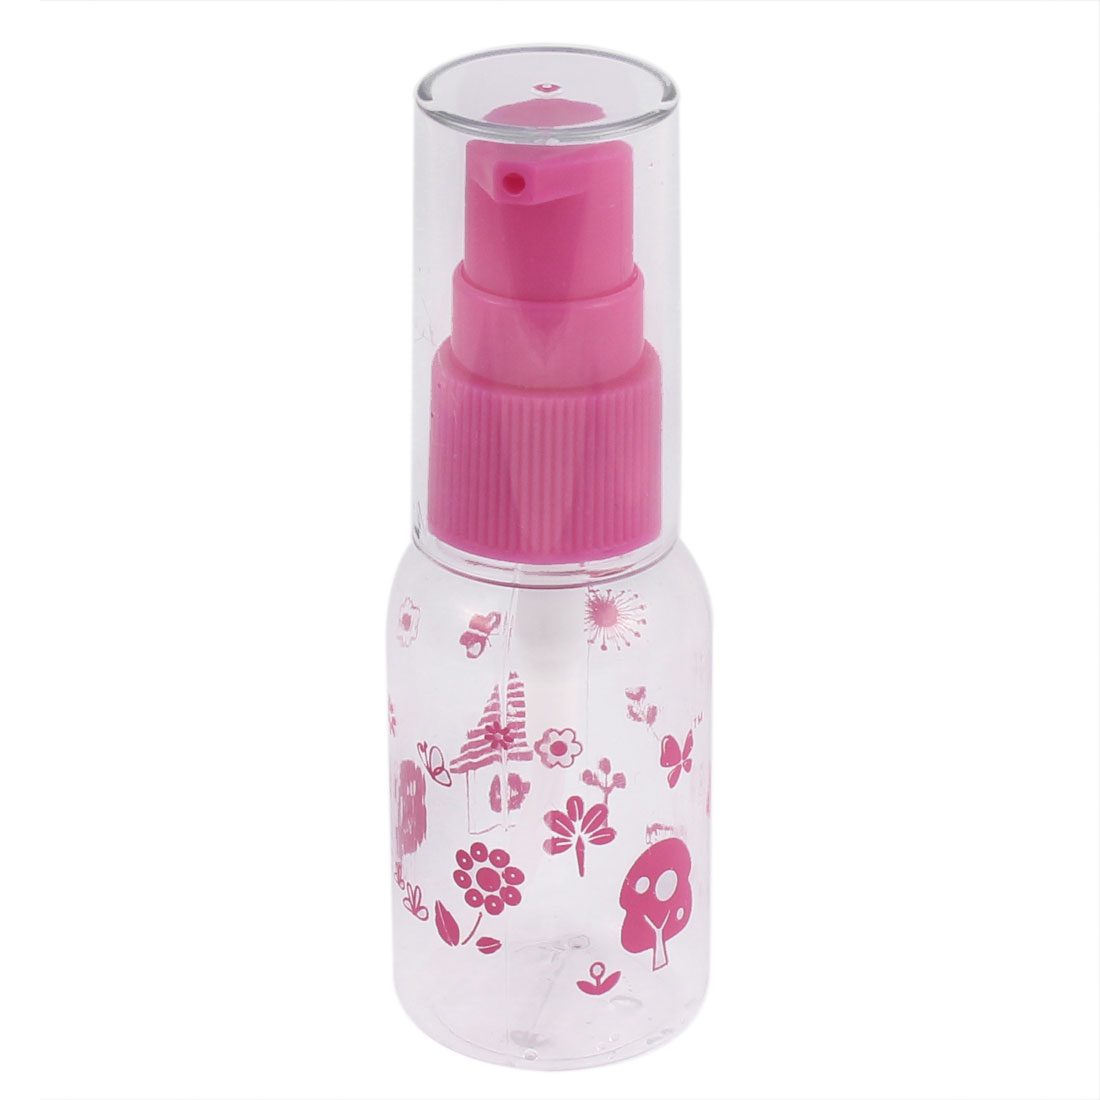 Traveling Plastic Cosmetic Liquid Container Spray Bottle 30ml Fuchsia